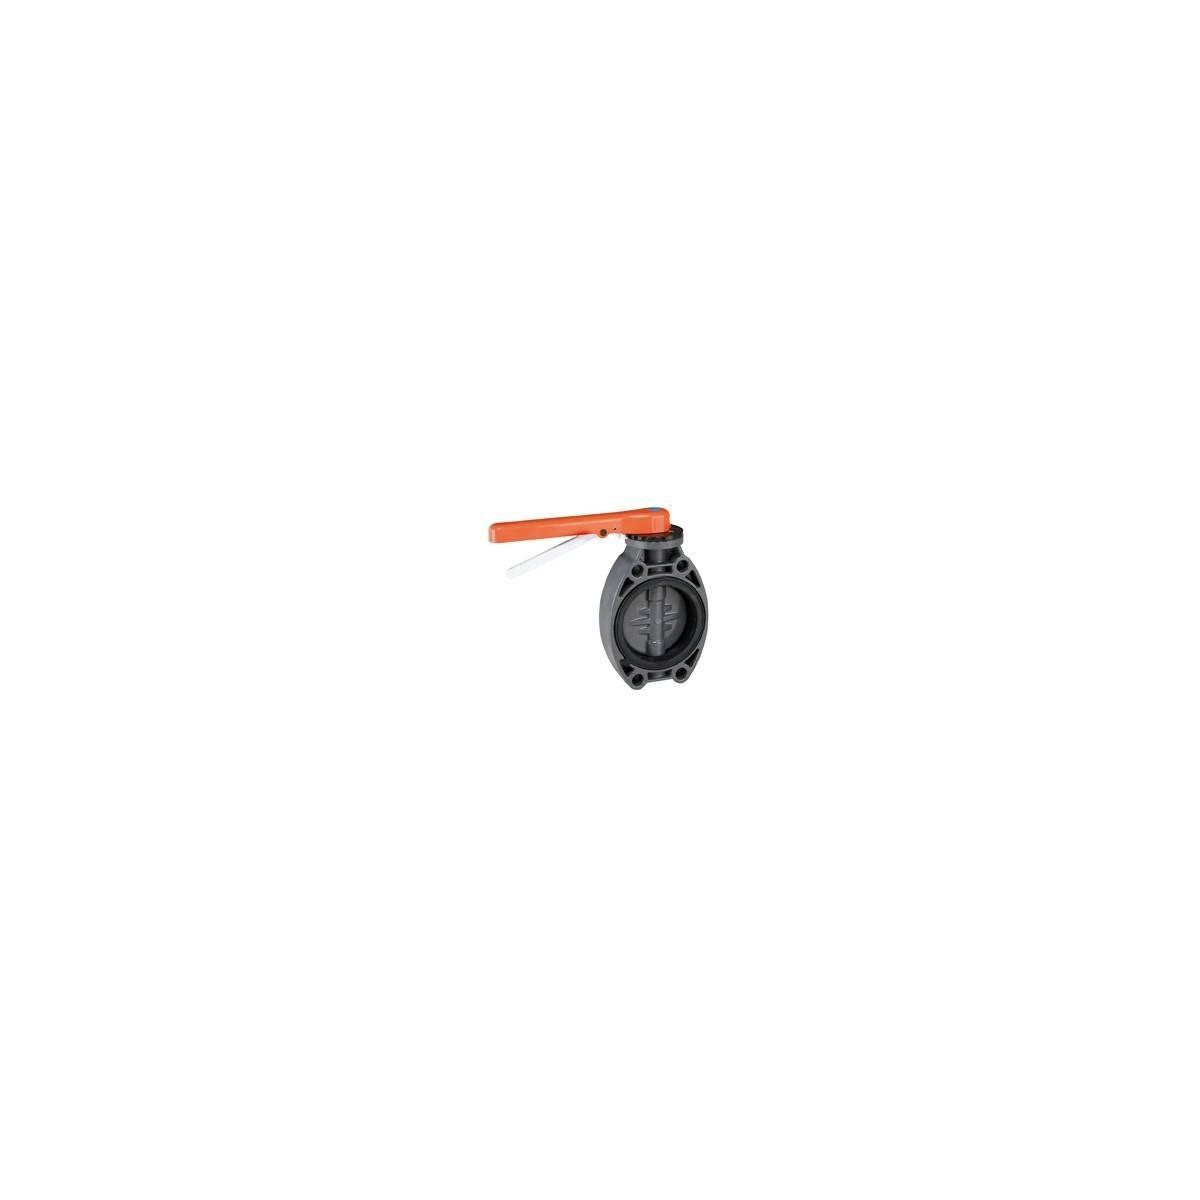 Válvula de mariposa PVC Cepex Serie Standard EPDM